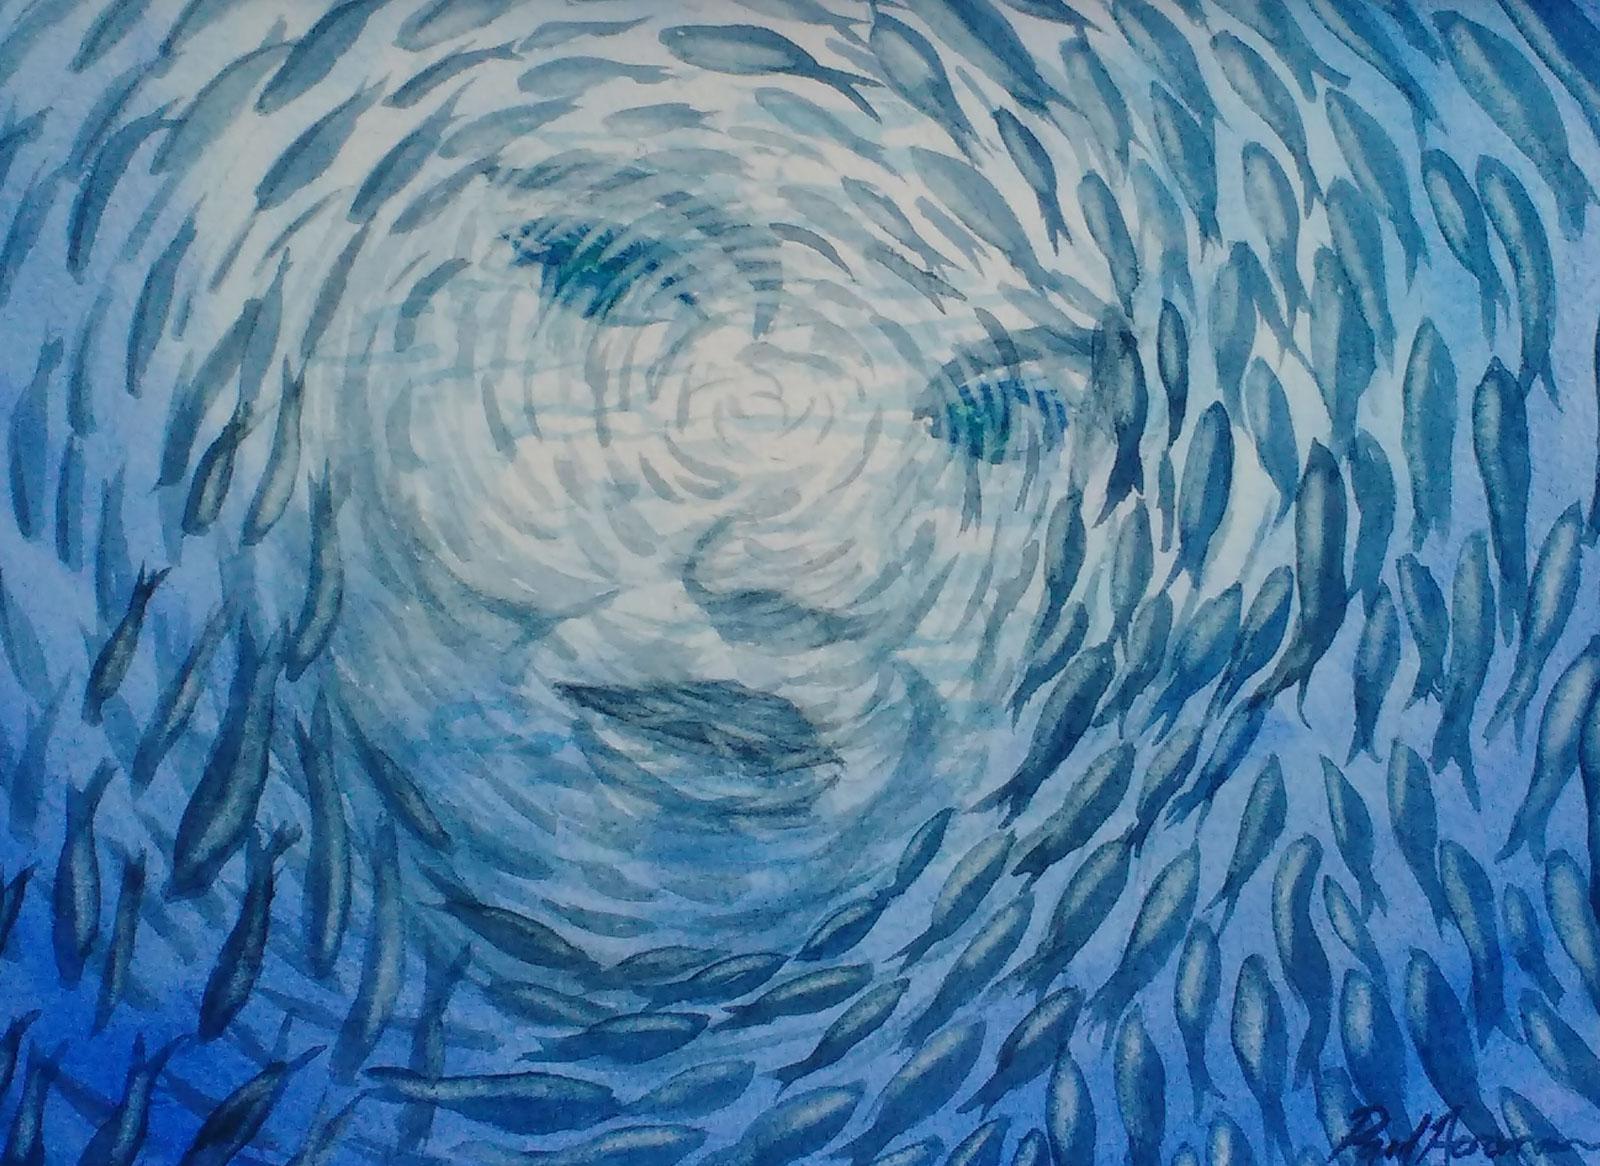 Paul Acraman-fantasy-sea-painting-girl-Ocean Dream Girl 2